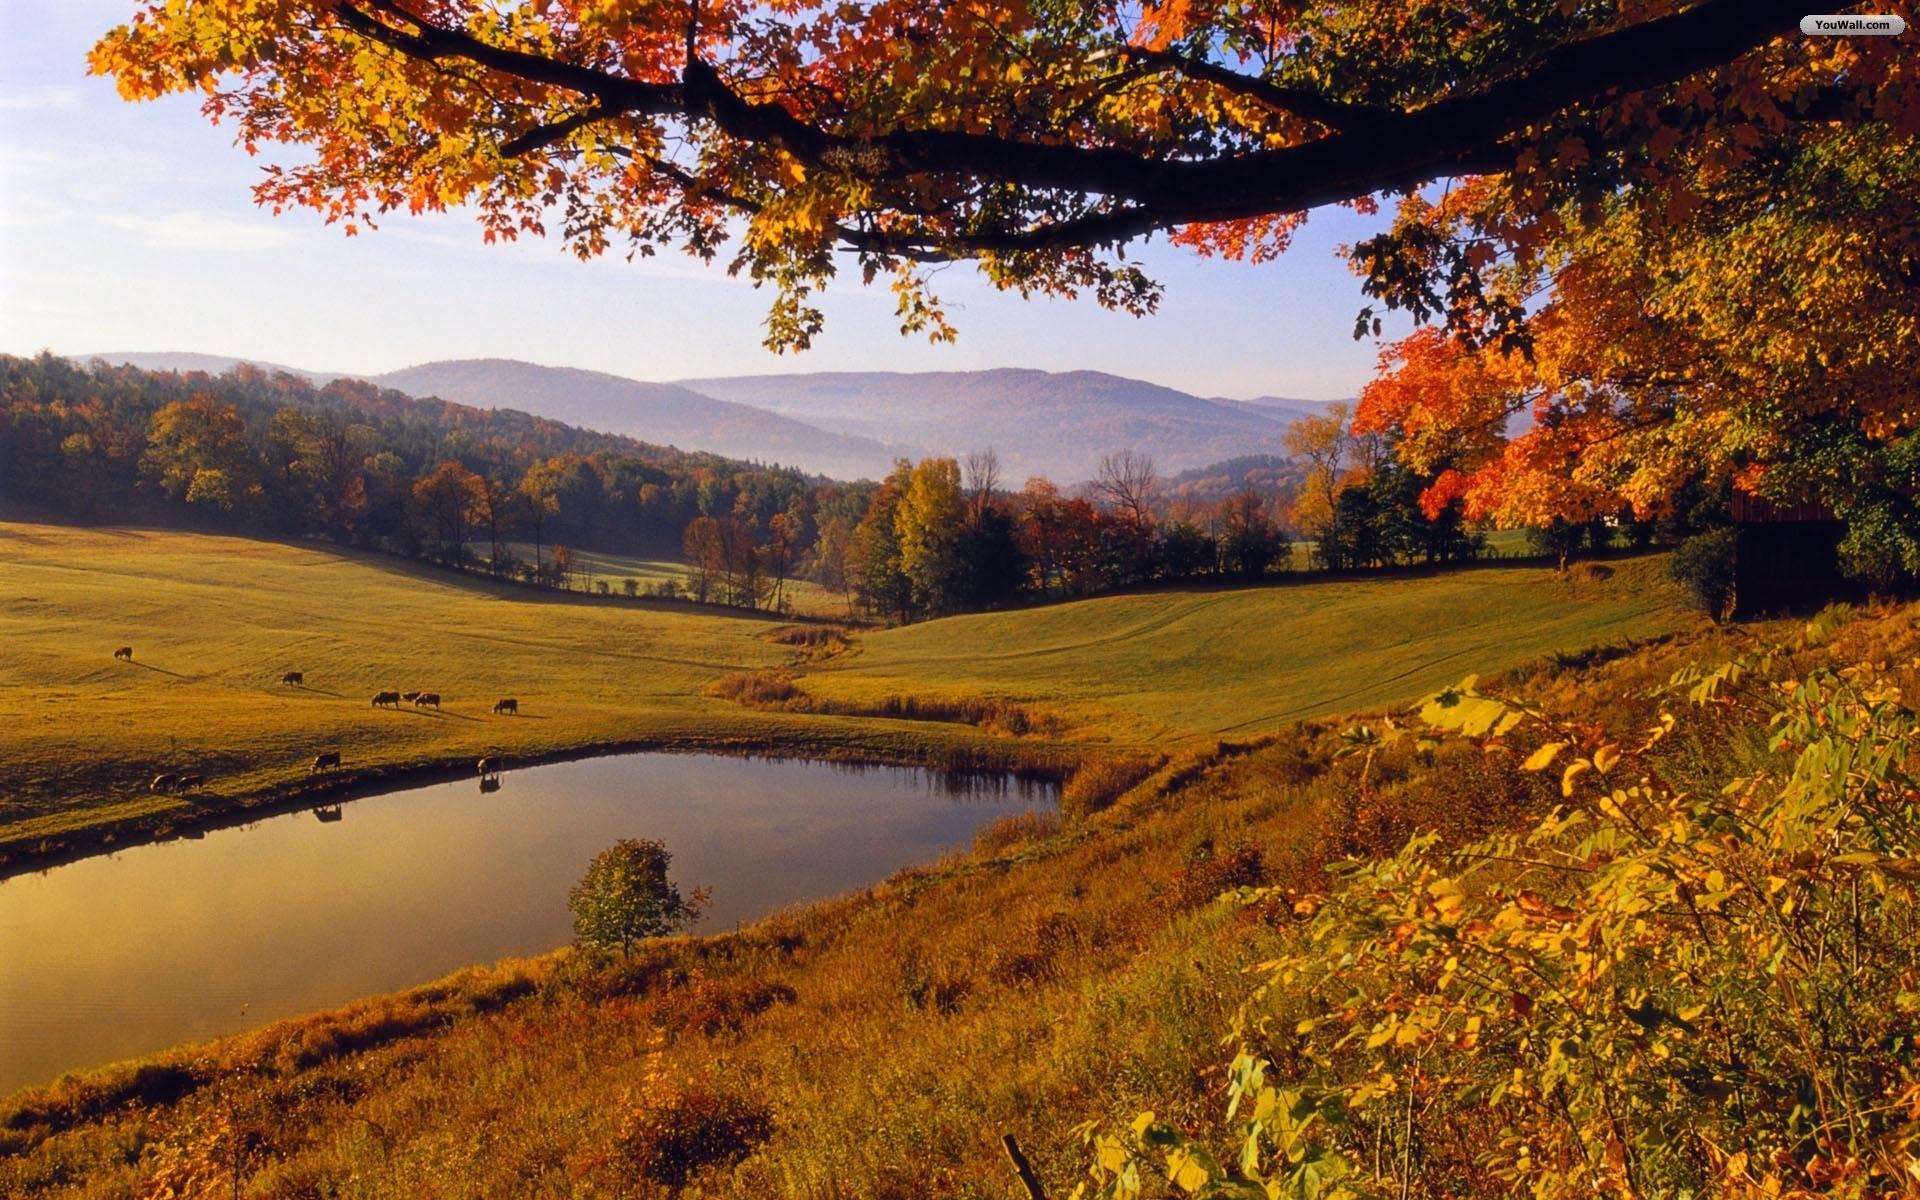 Landscape Wallpapers HD · Autumn TreesAutumn LeavesLandscape …